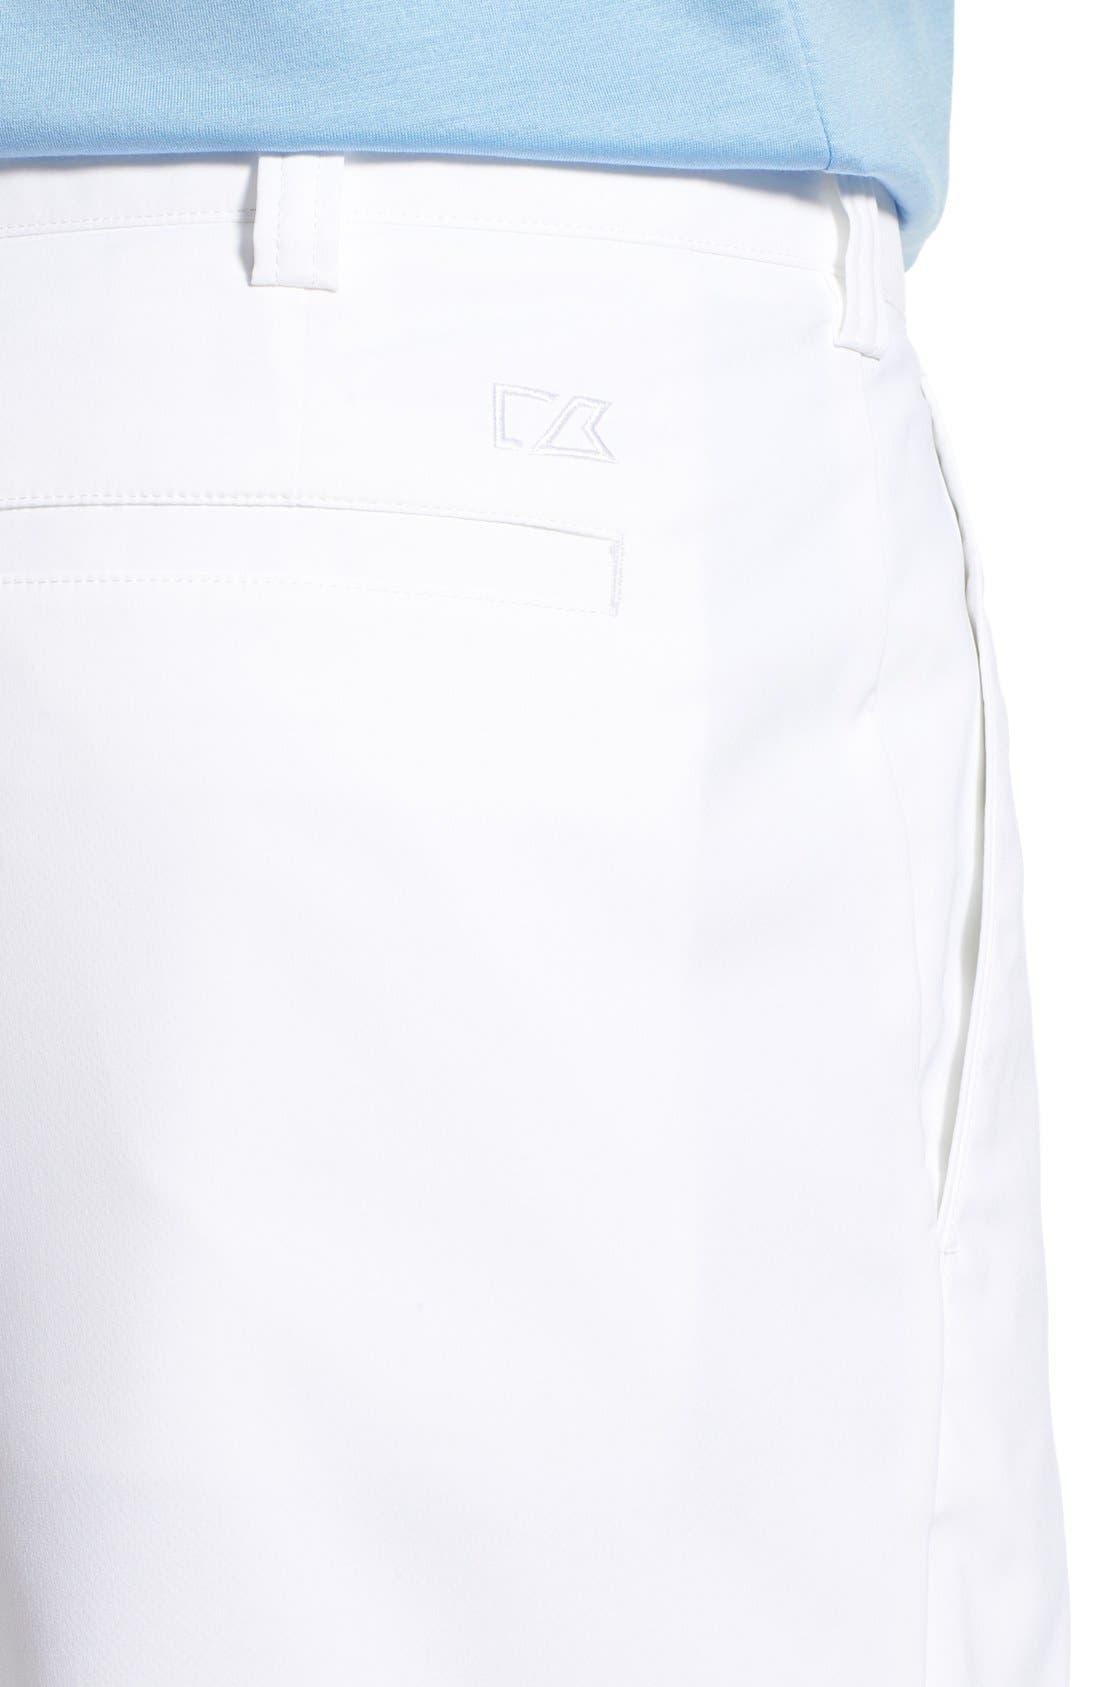 DryTec Shorts,                             Alternate thumbnail 3, color,                             WHITE